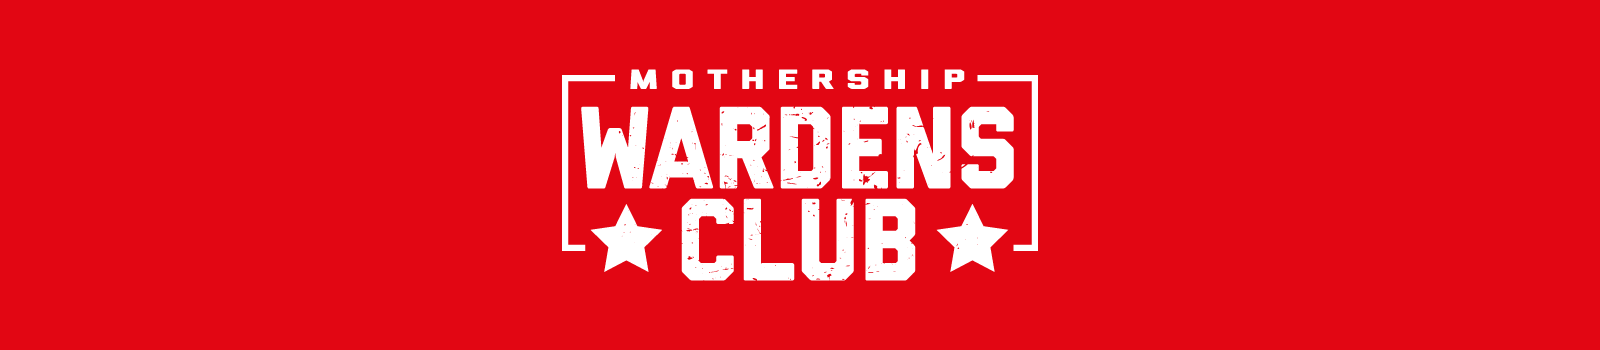 wardens-club-hero.png